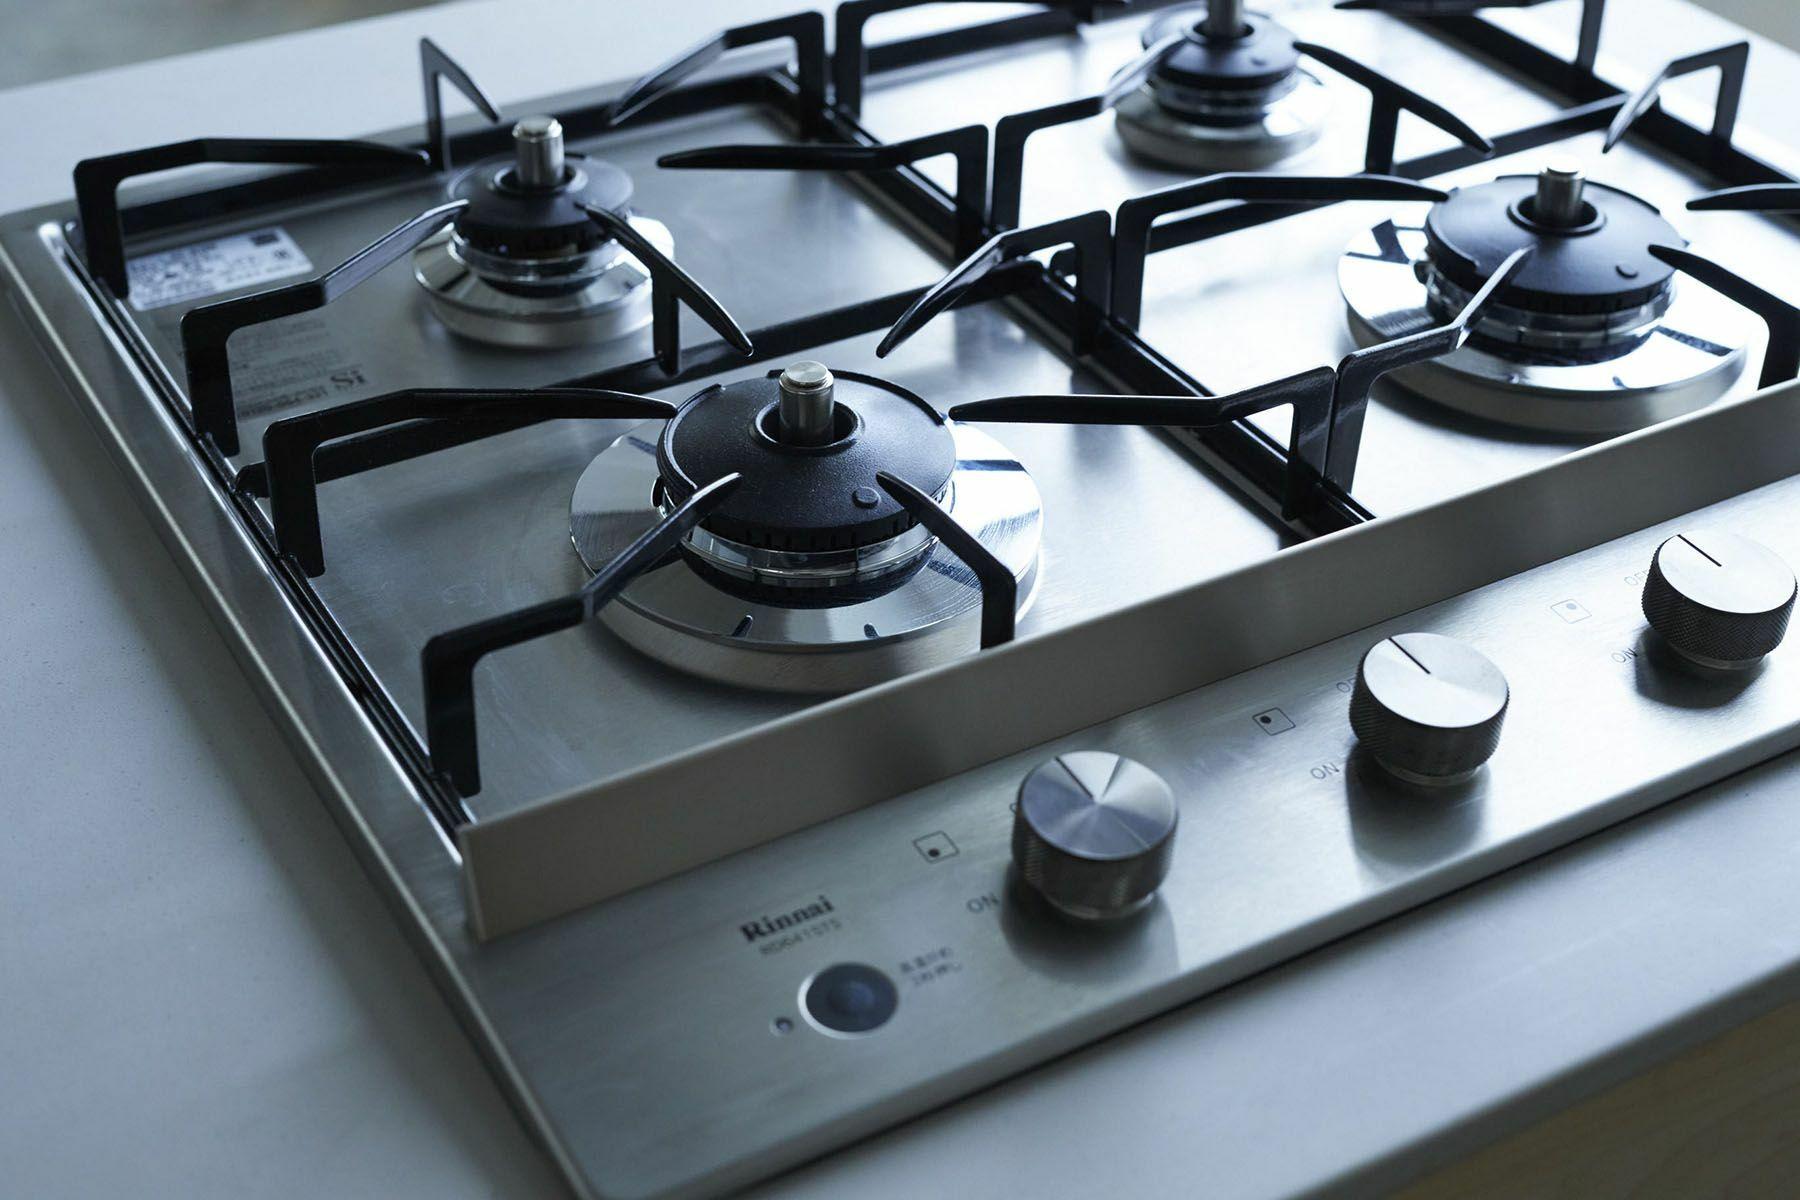 sinca kitchen (シンカ キッチン)